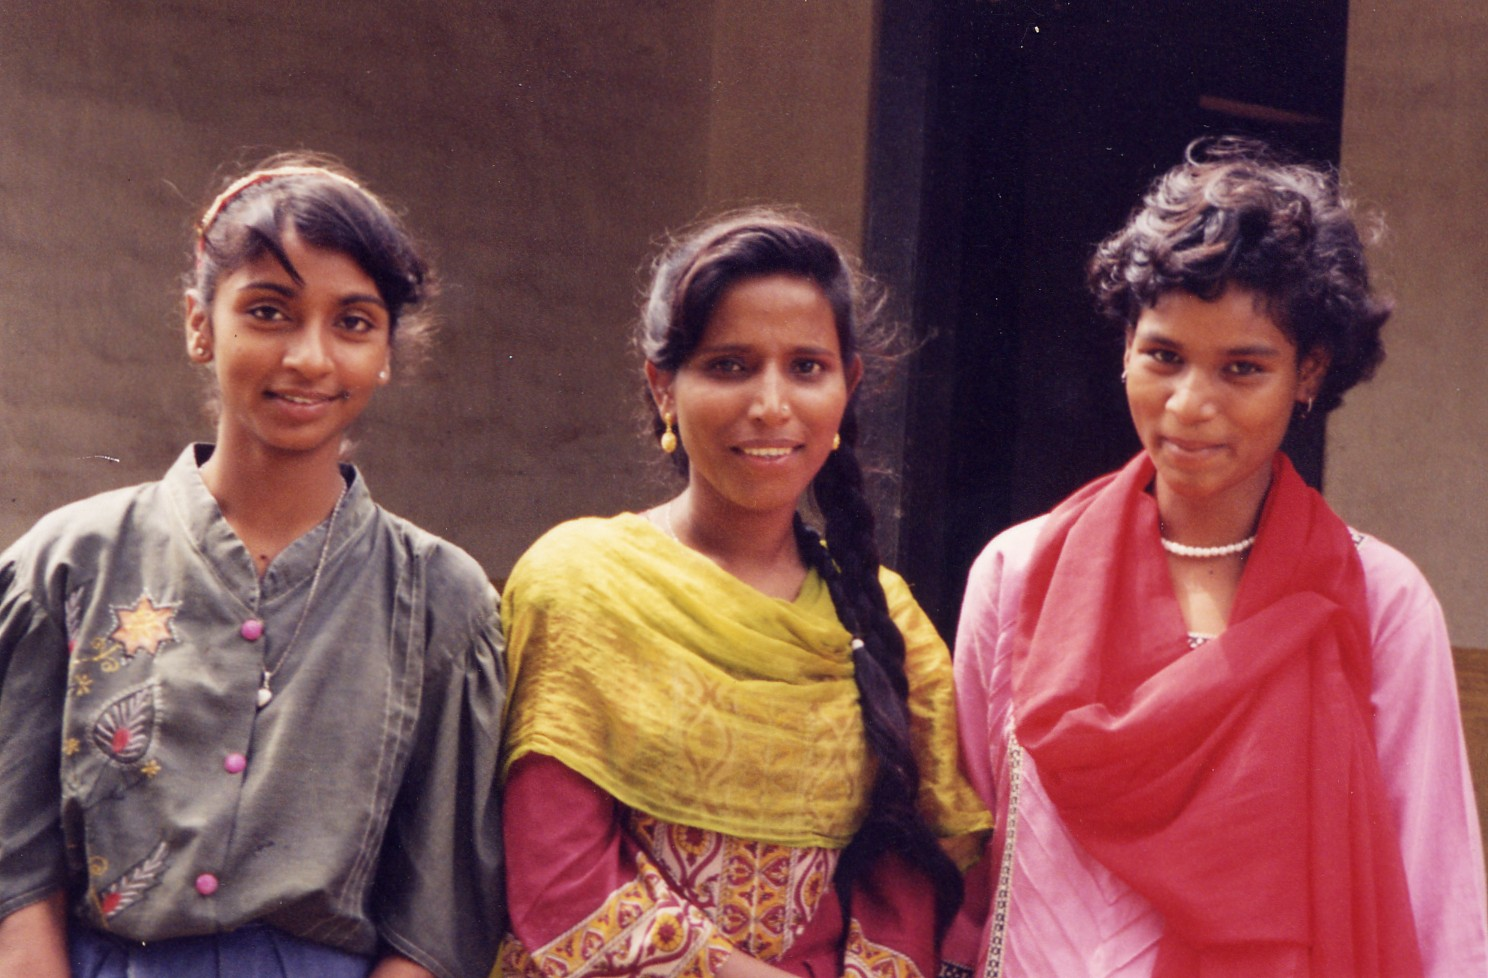 India_Young_Women.JPG